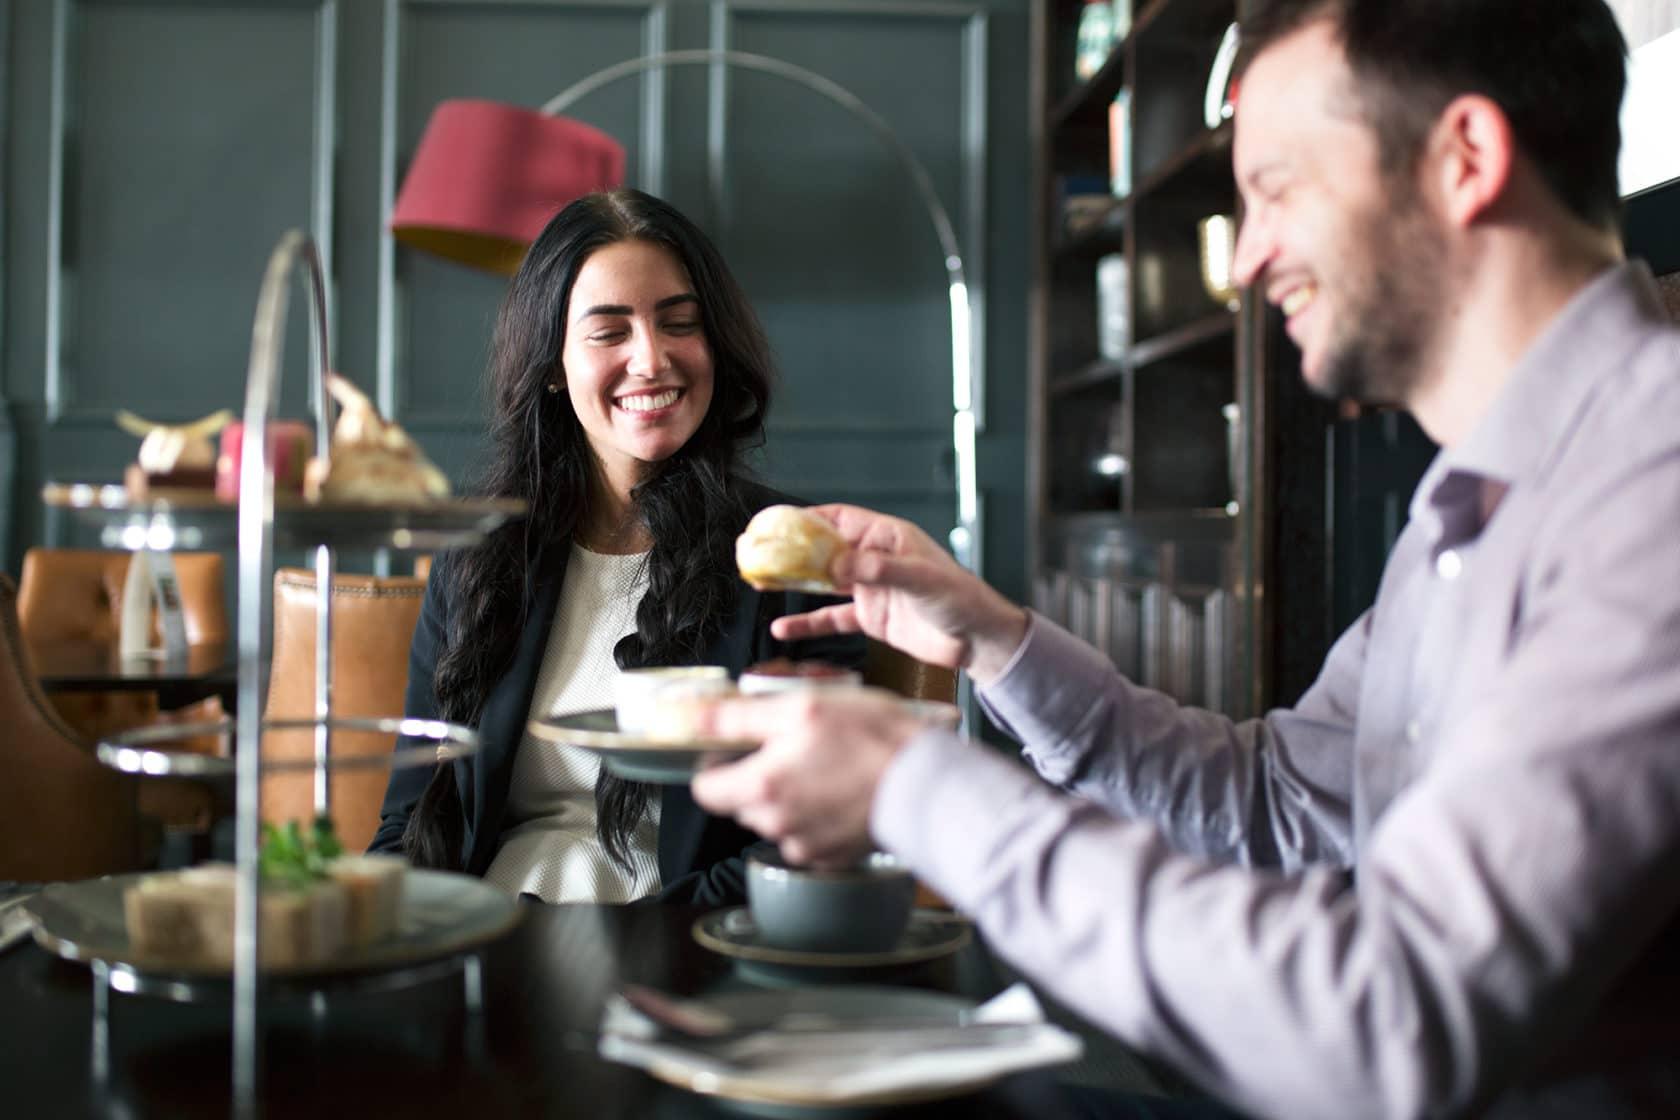 Afternoon tea at The Hilton Brighton Metropole Bar